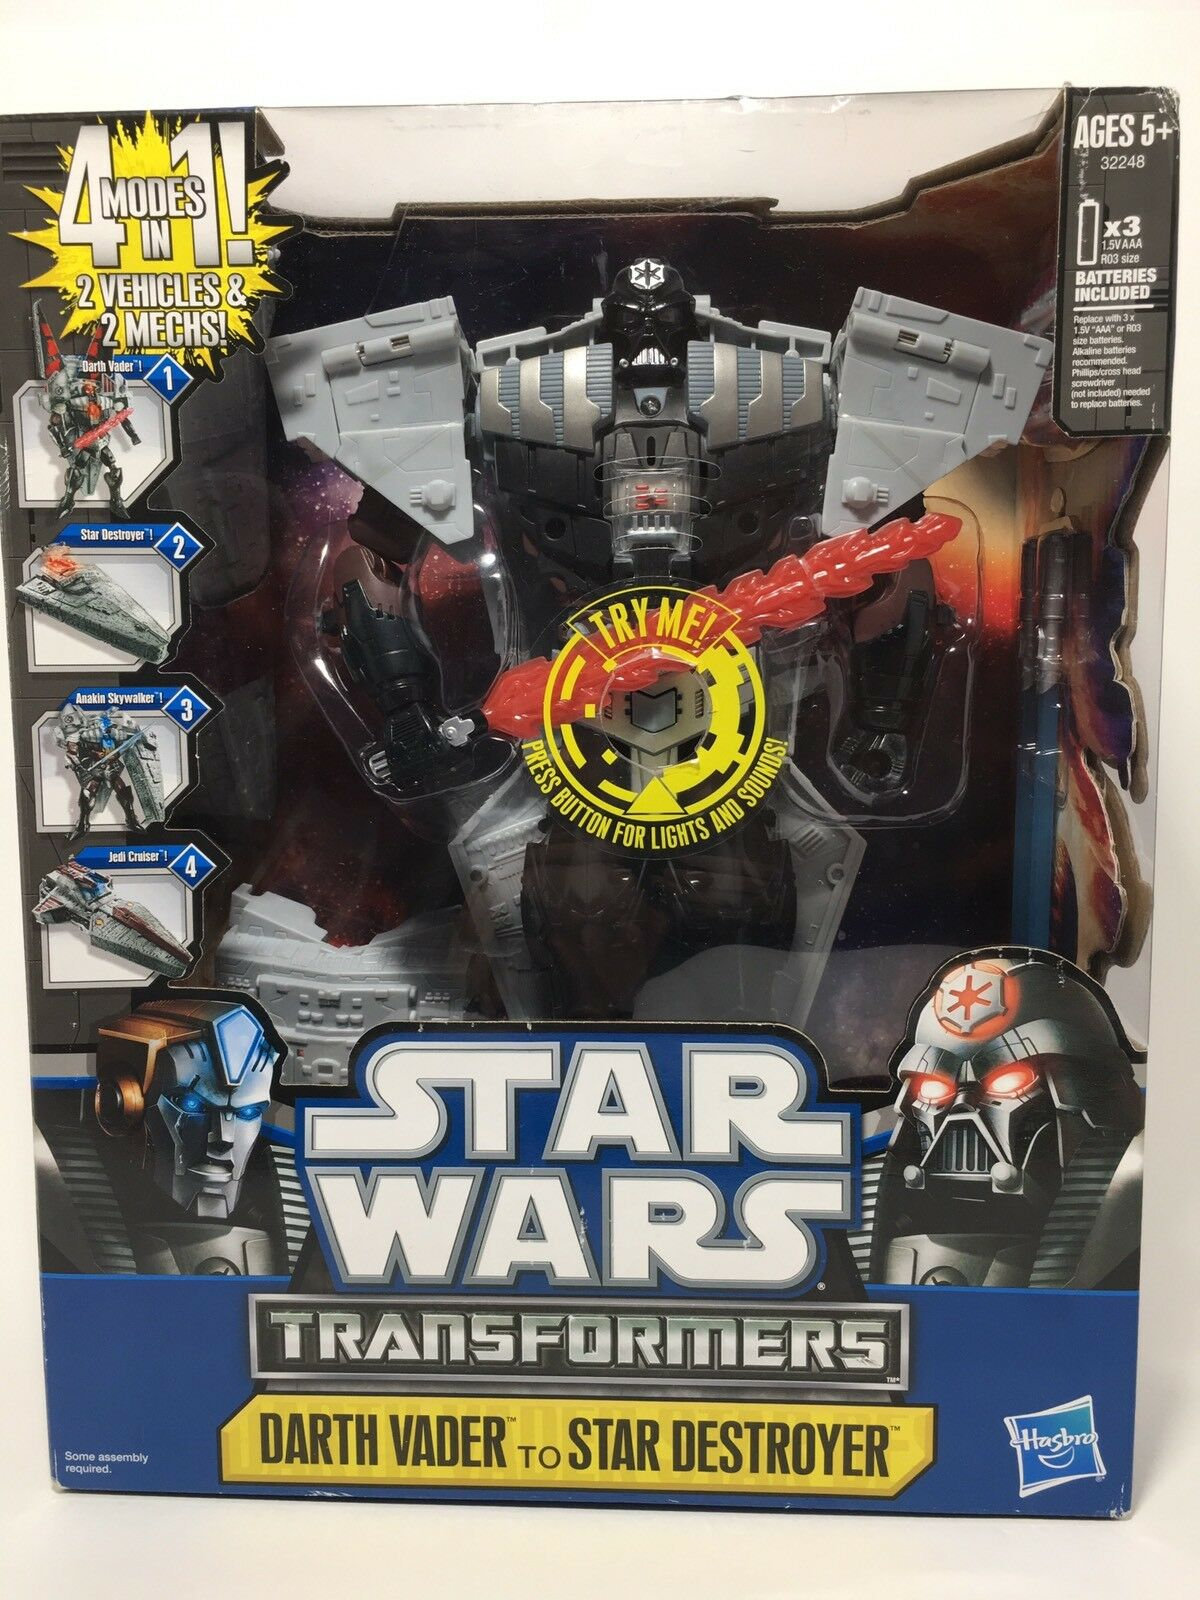 Star Wars Transformers Darth Vader to Star Destroyer - Hasbro - New